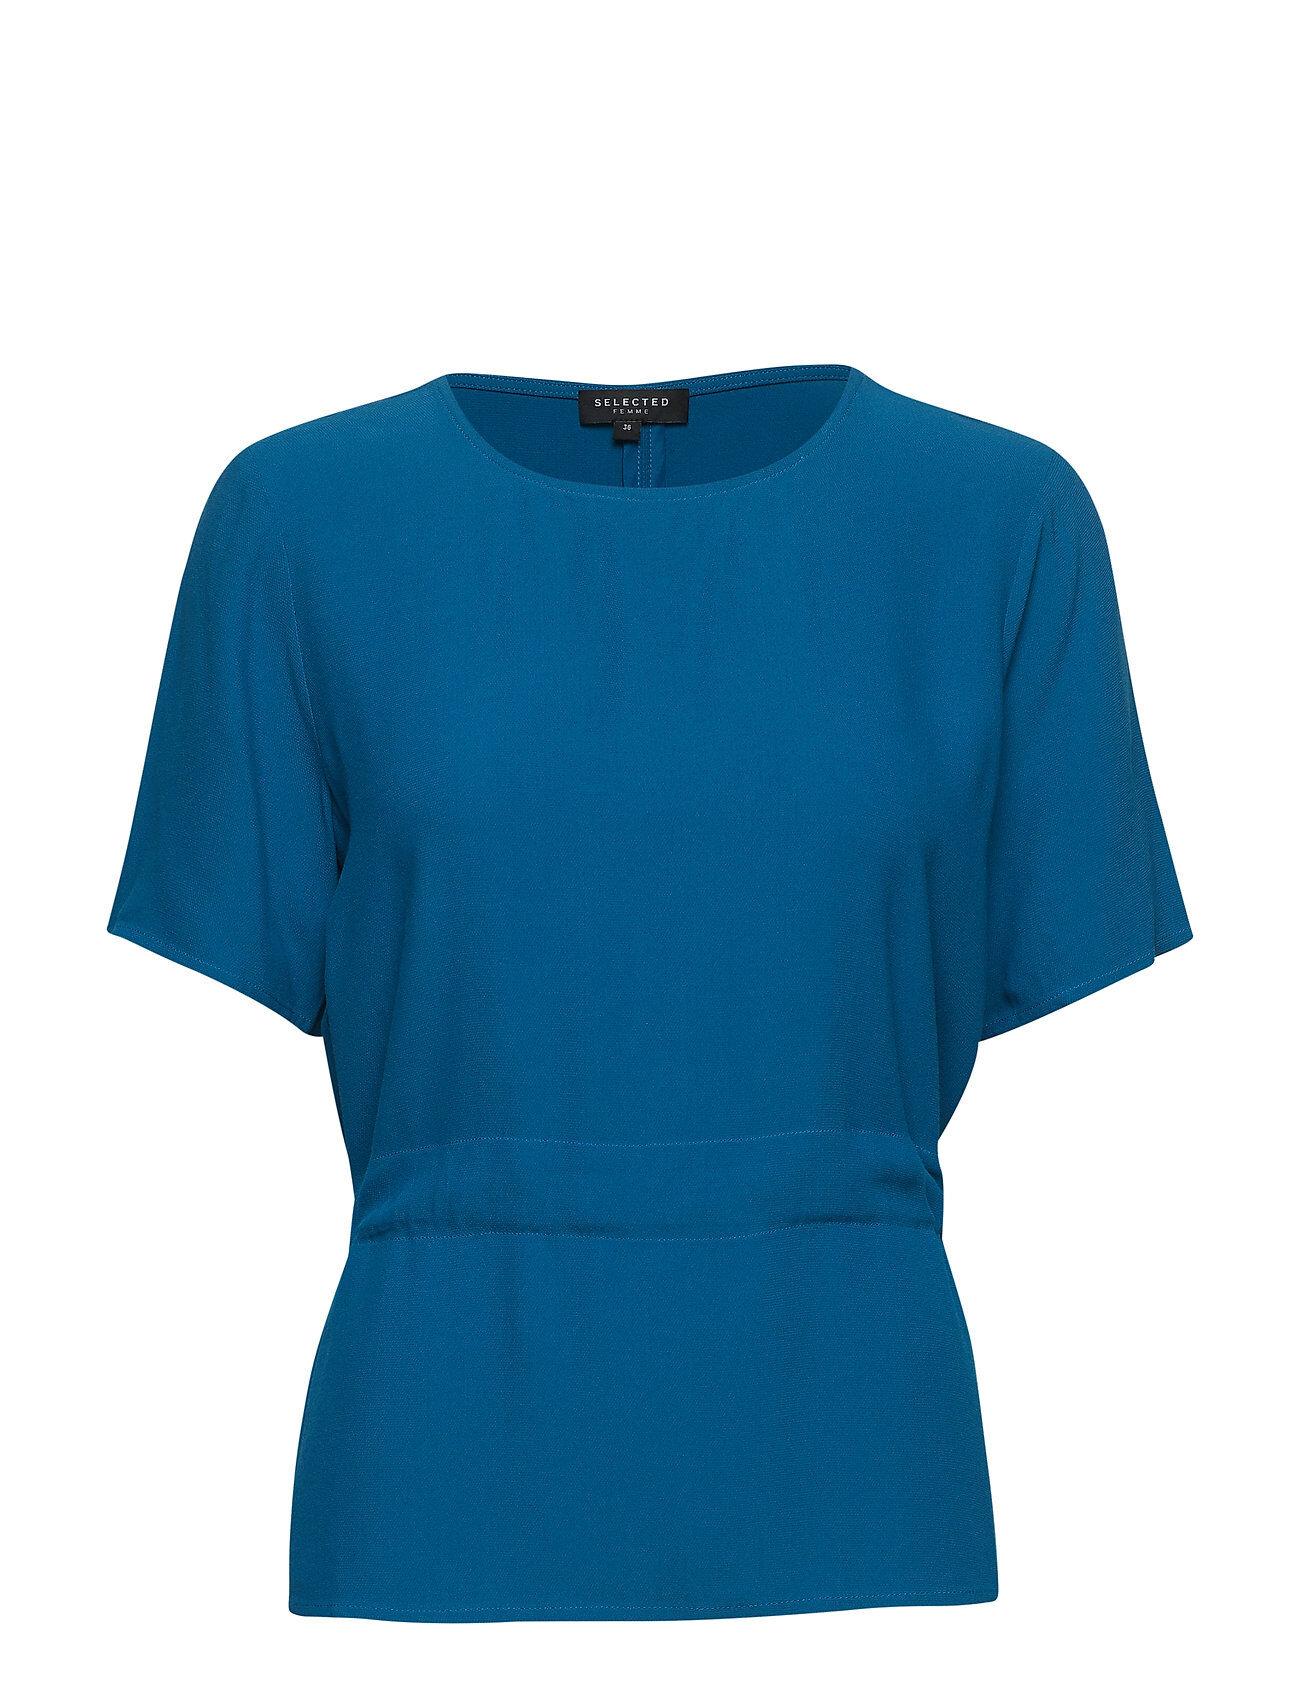 Selected Femme Slftanna Ss Top B T-shirts & Tops Short-sleeved Sininen Selected Femme